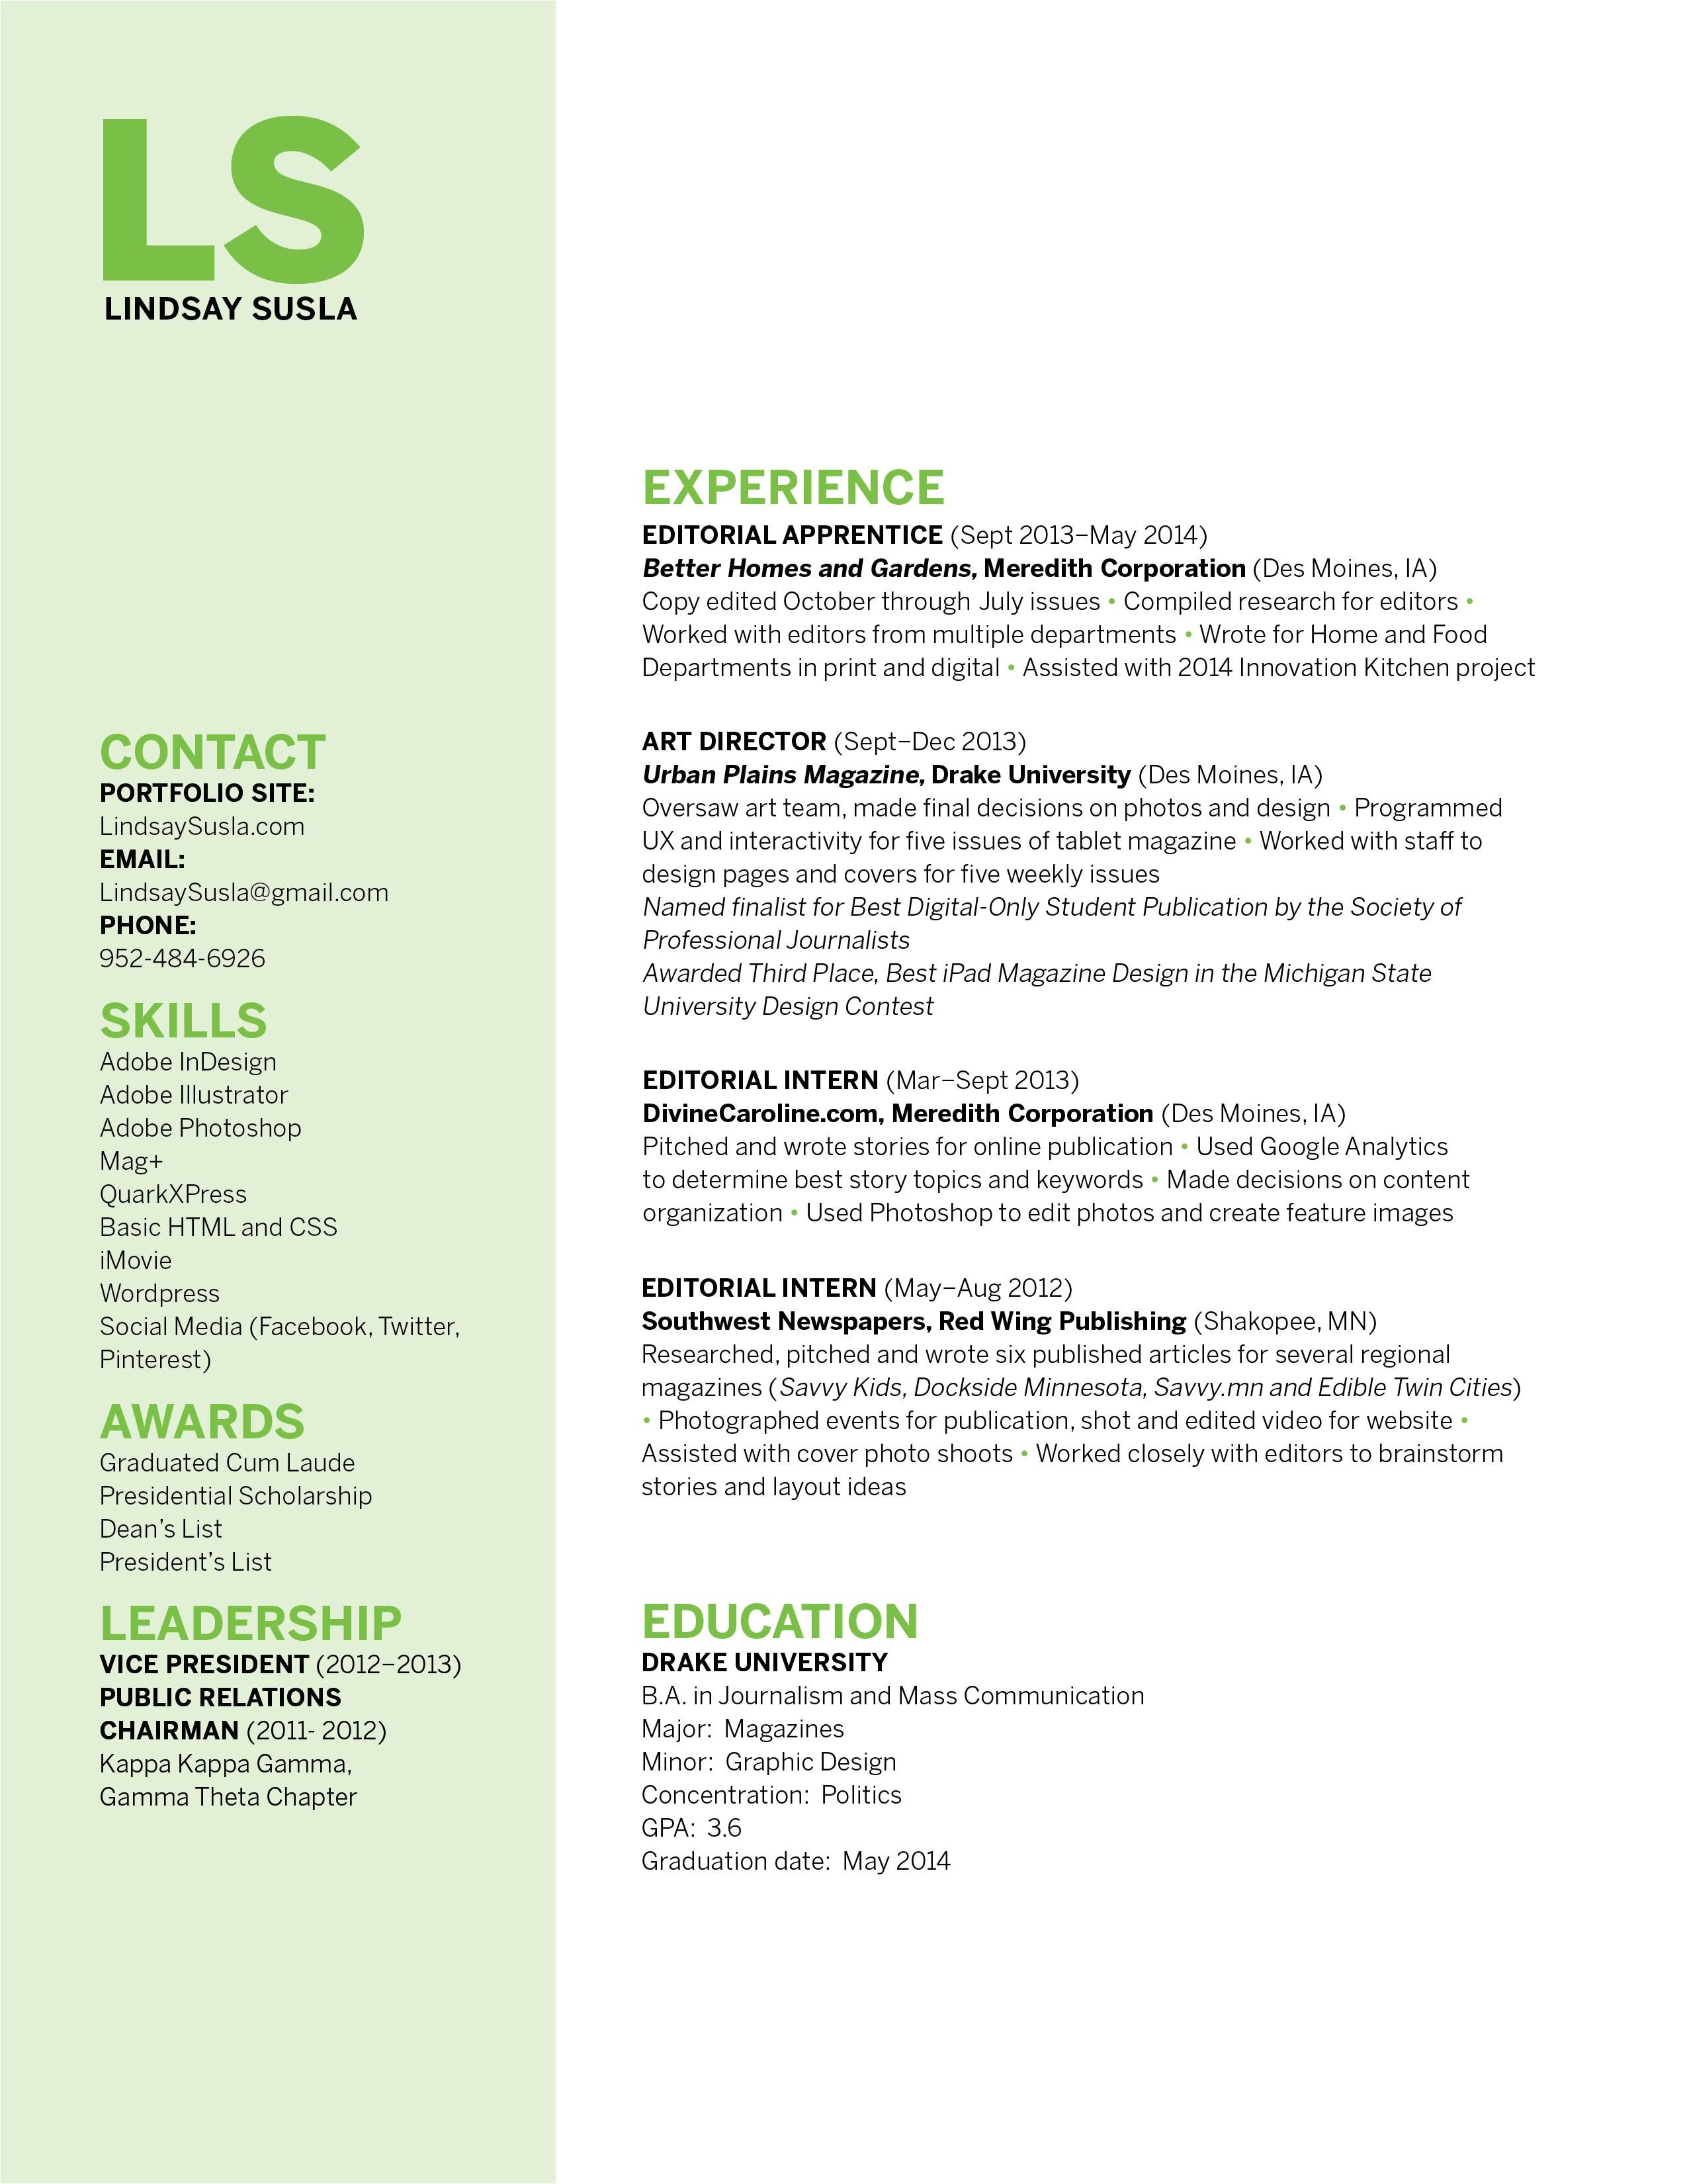 Quickstart Resume Templates Resume Writing Blog Lindsay Susla Resume Lindsay Susla